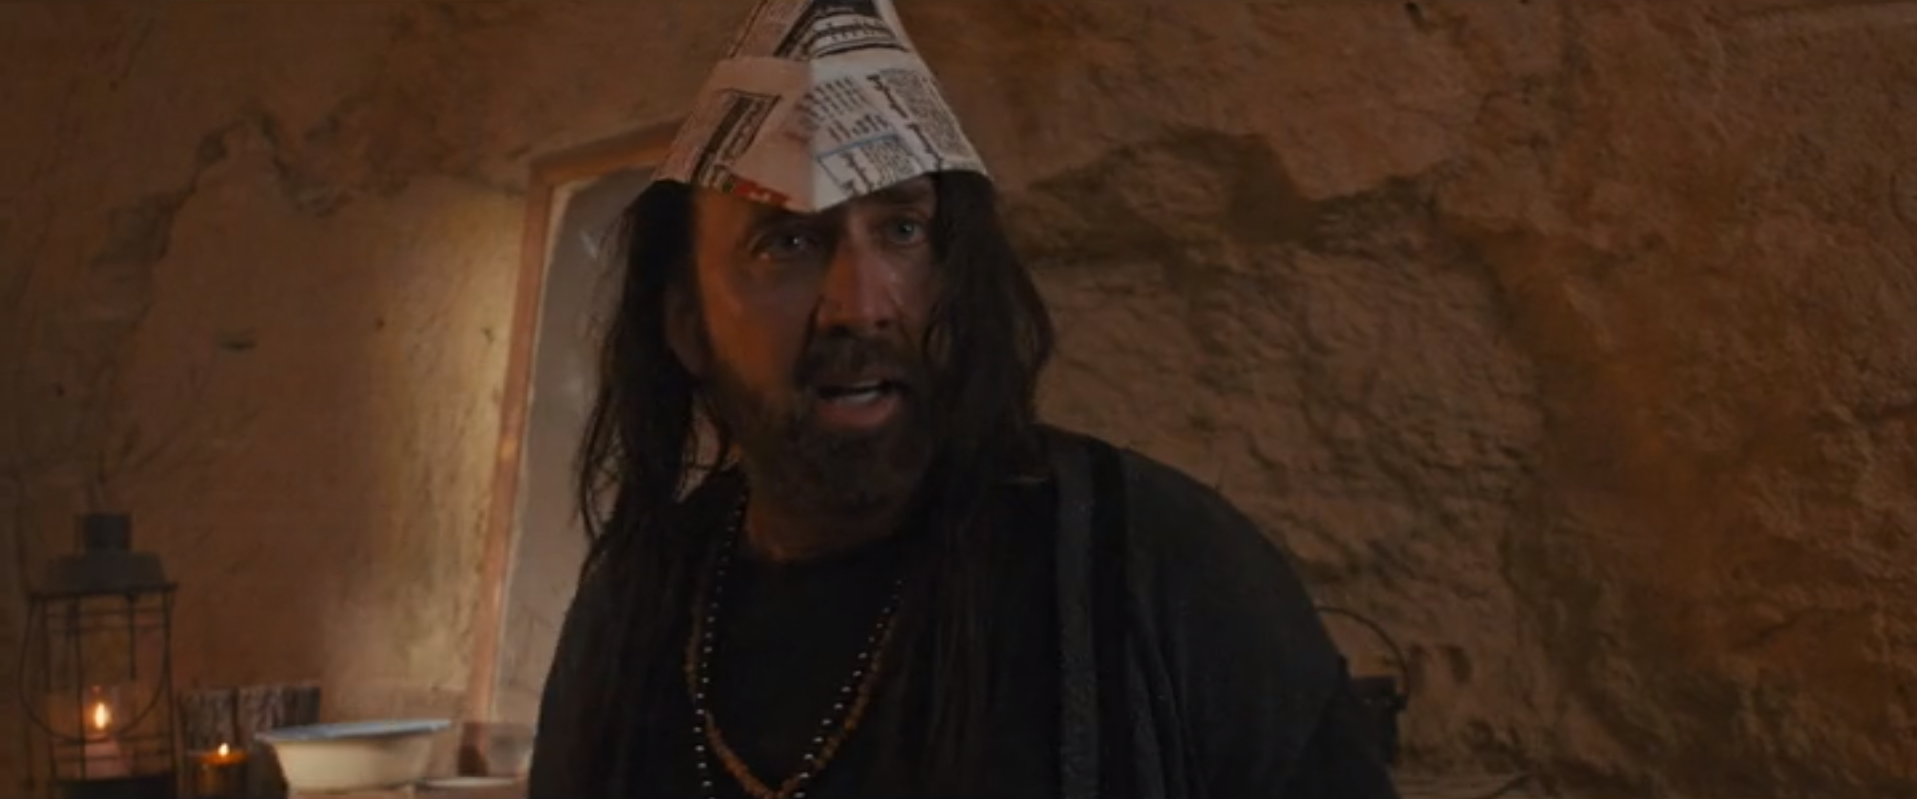 Nicolas Cage in Martial Arts Jiu Jitsu Movie discussed on Christian Podcast Cinematic Doctrine